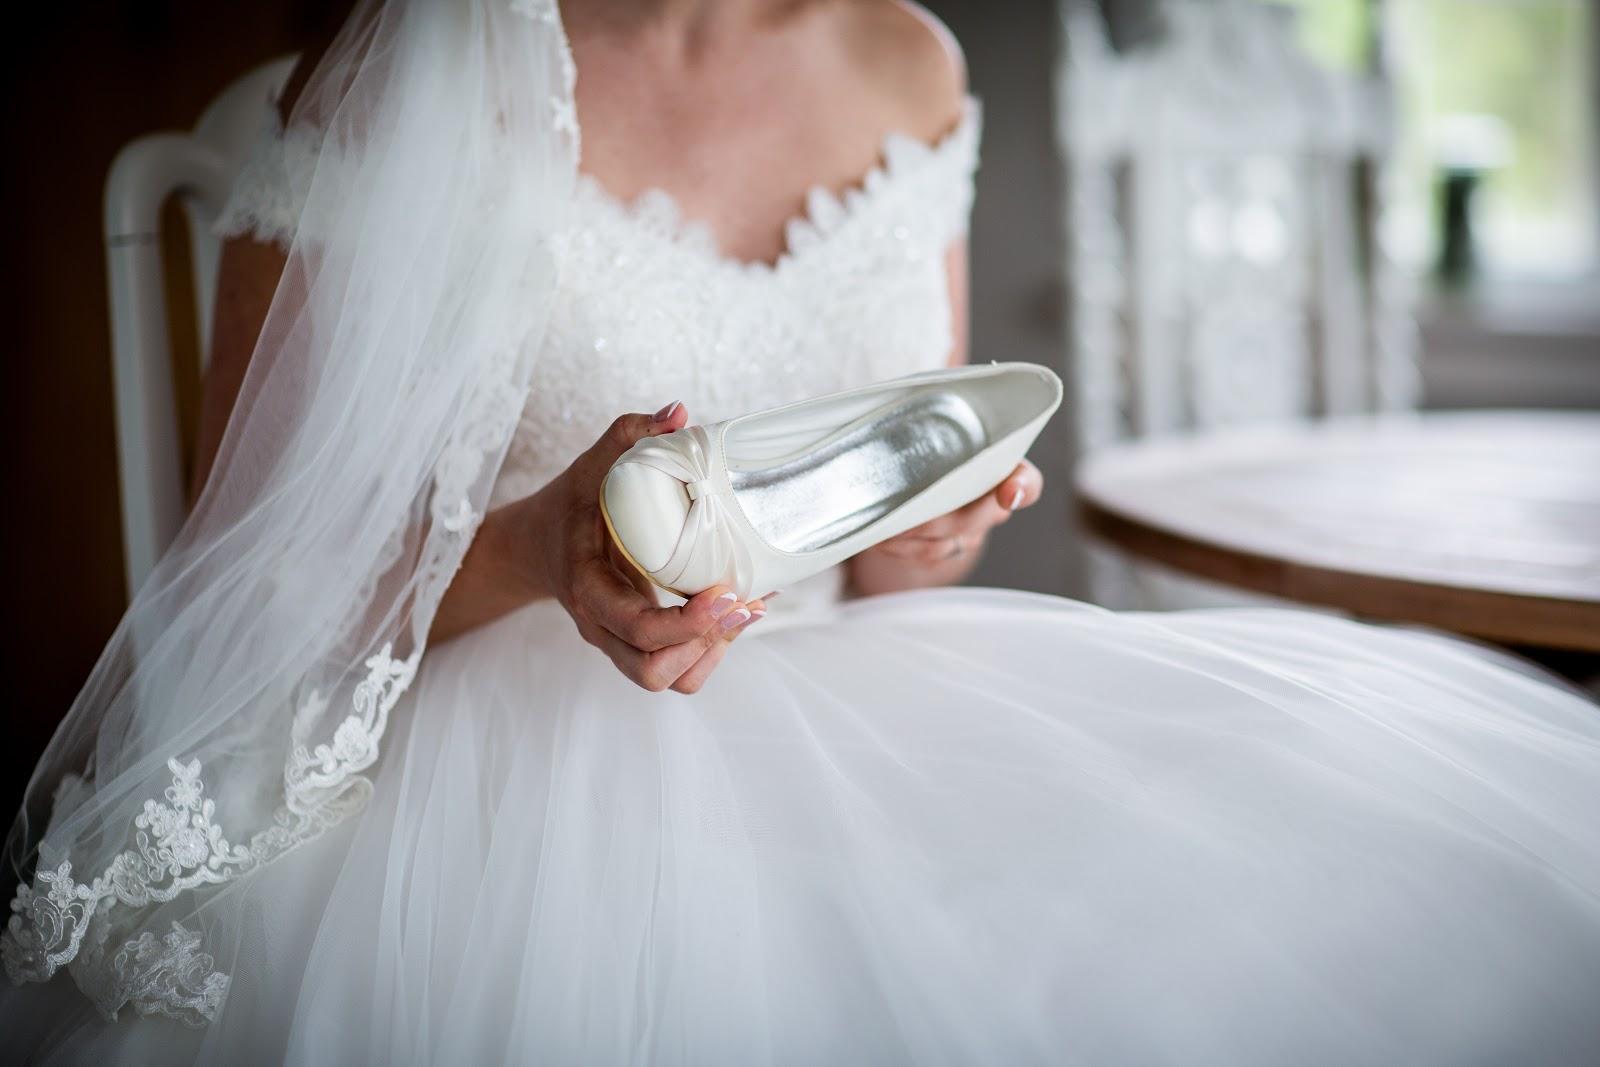 A bride in a white, Western style wedding dress.